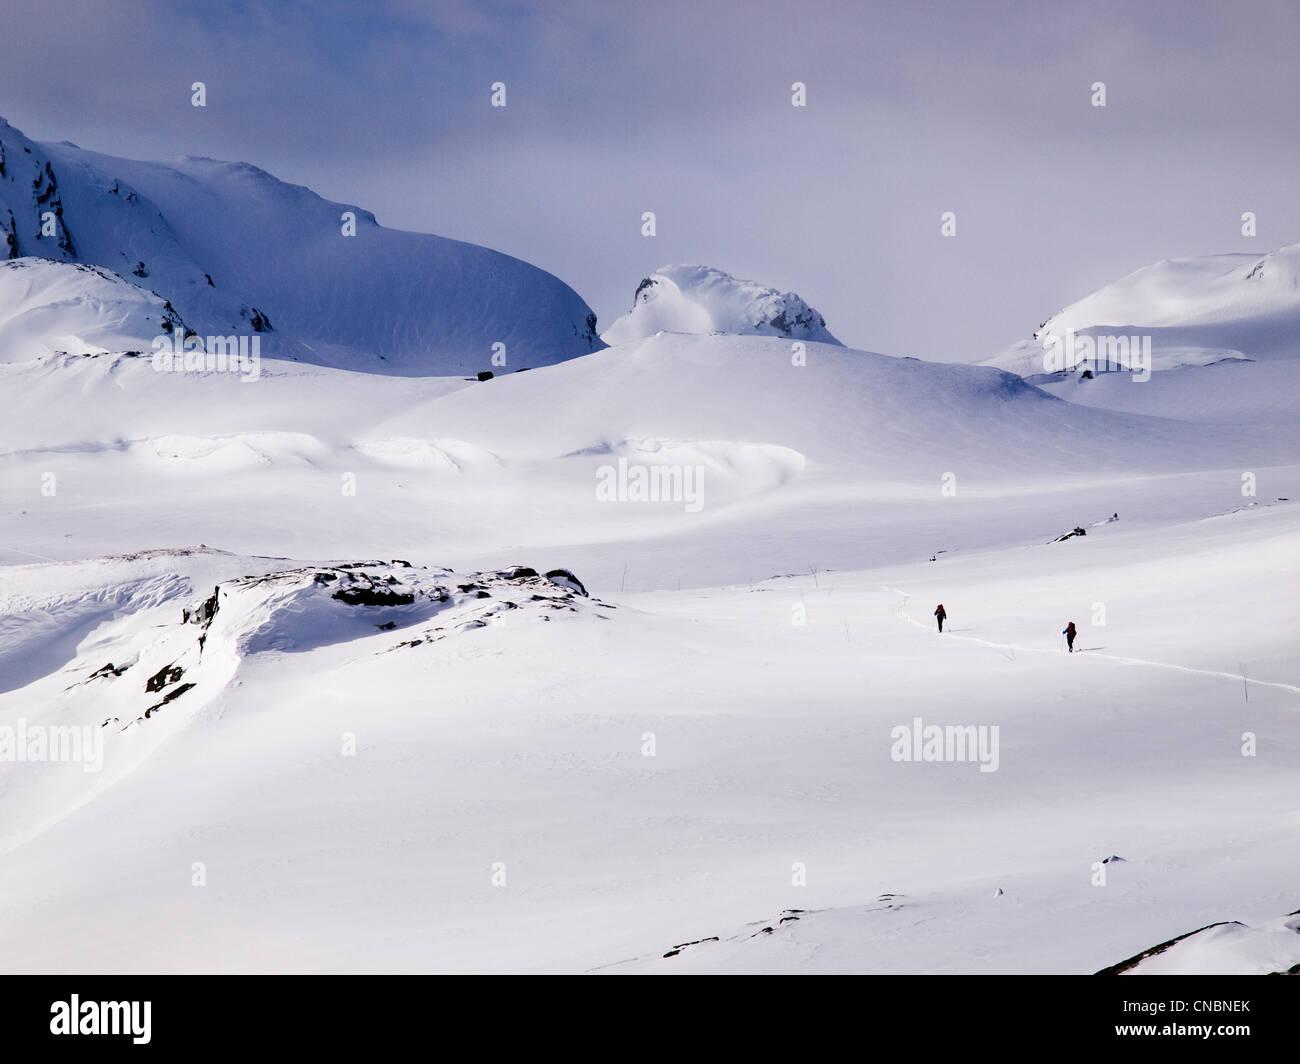 2 people ski touring in the Hardanger region of Norway - Stock Image